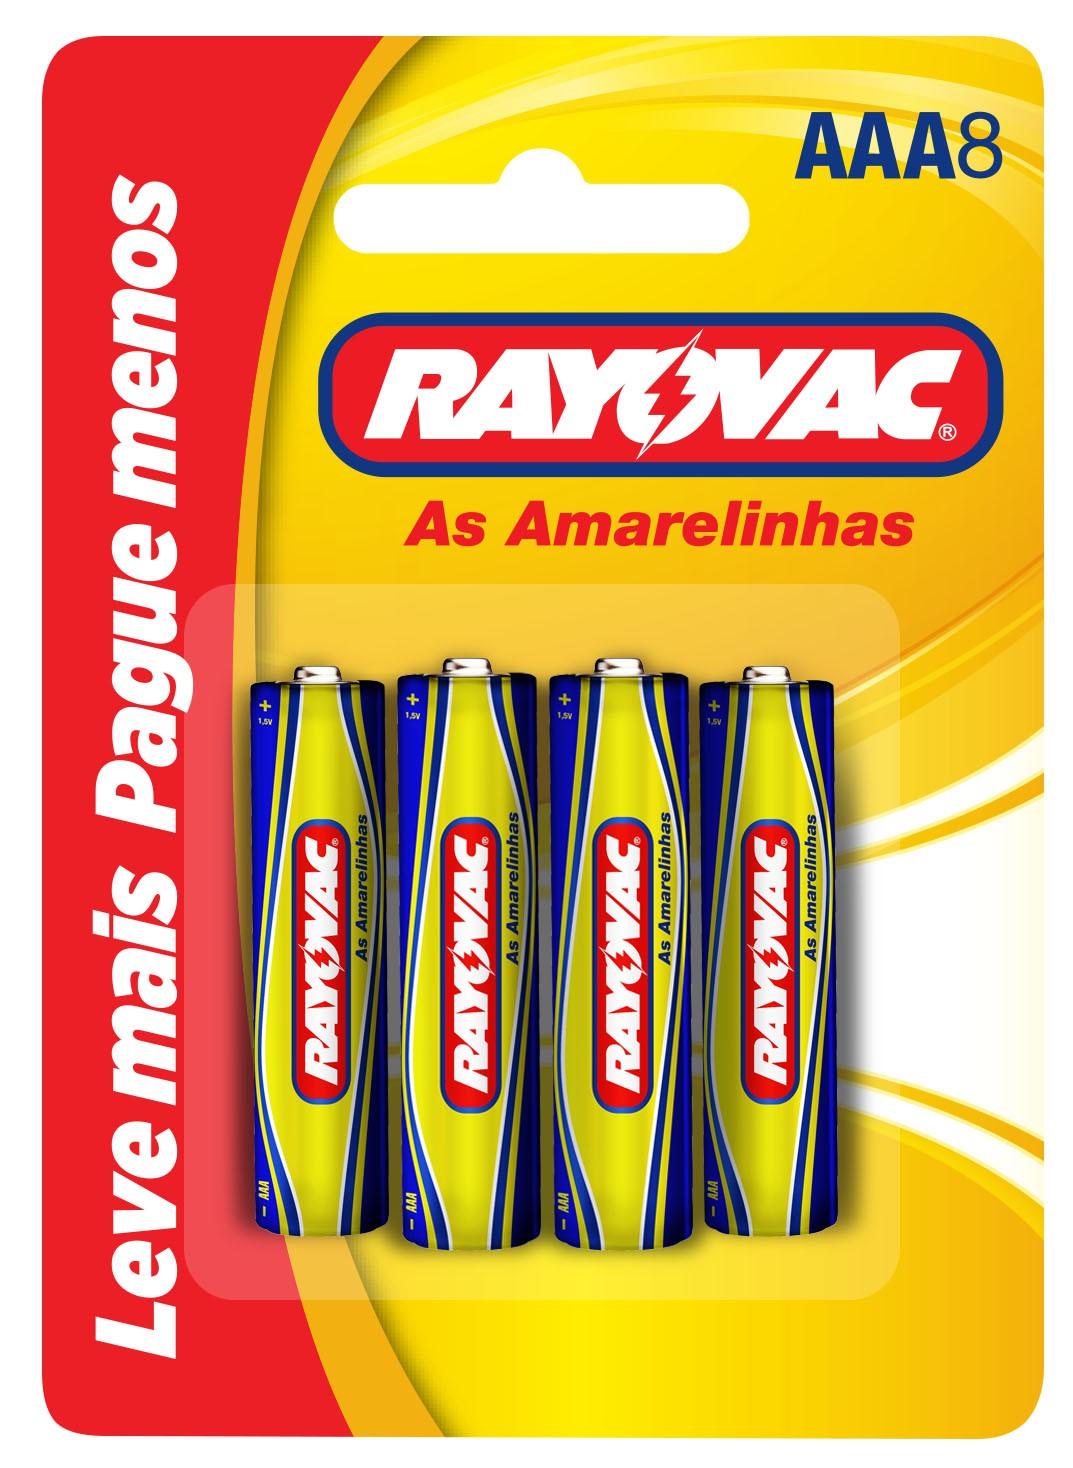 32 Pilhas AAA Zinco Carvão RAYOVAC 4 cartelas